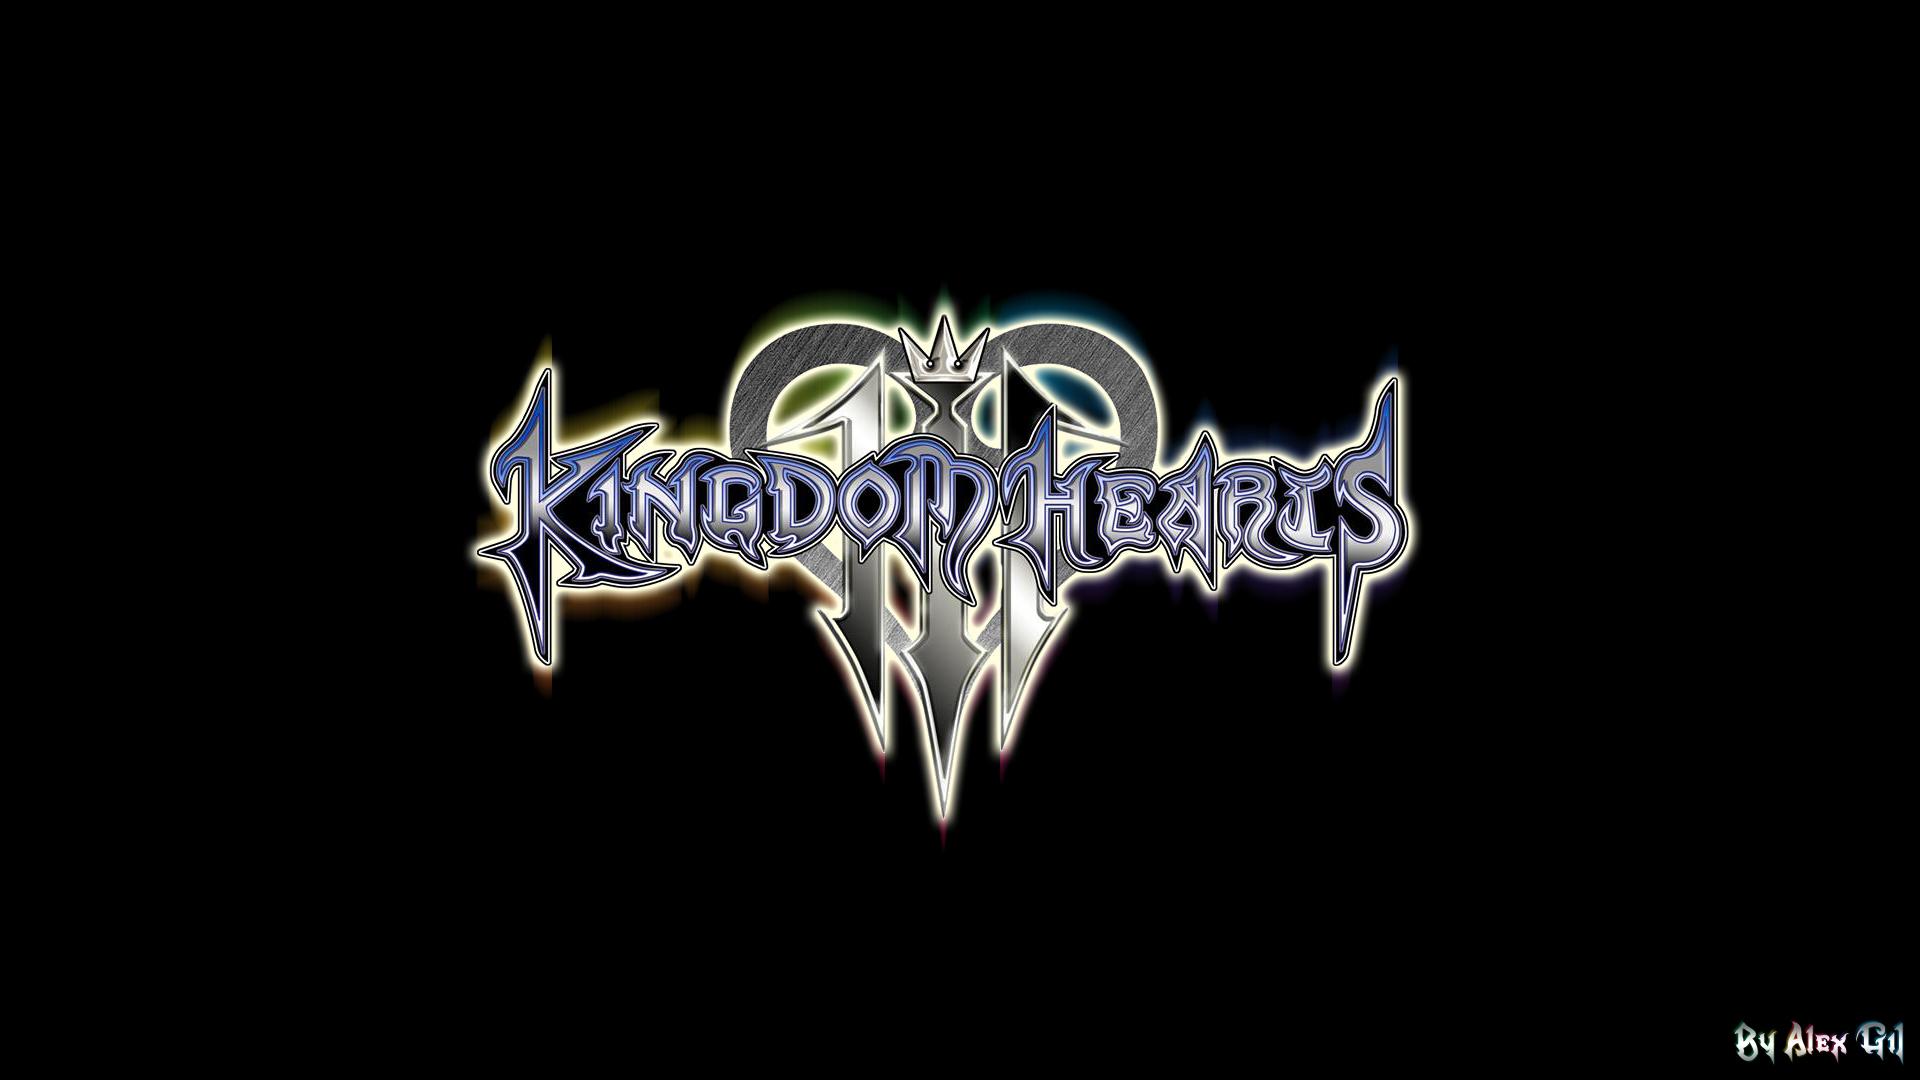 Kingdom Hearts 3 Wallpaper 19201080 Kingdom hearts 1920x1080